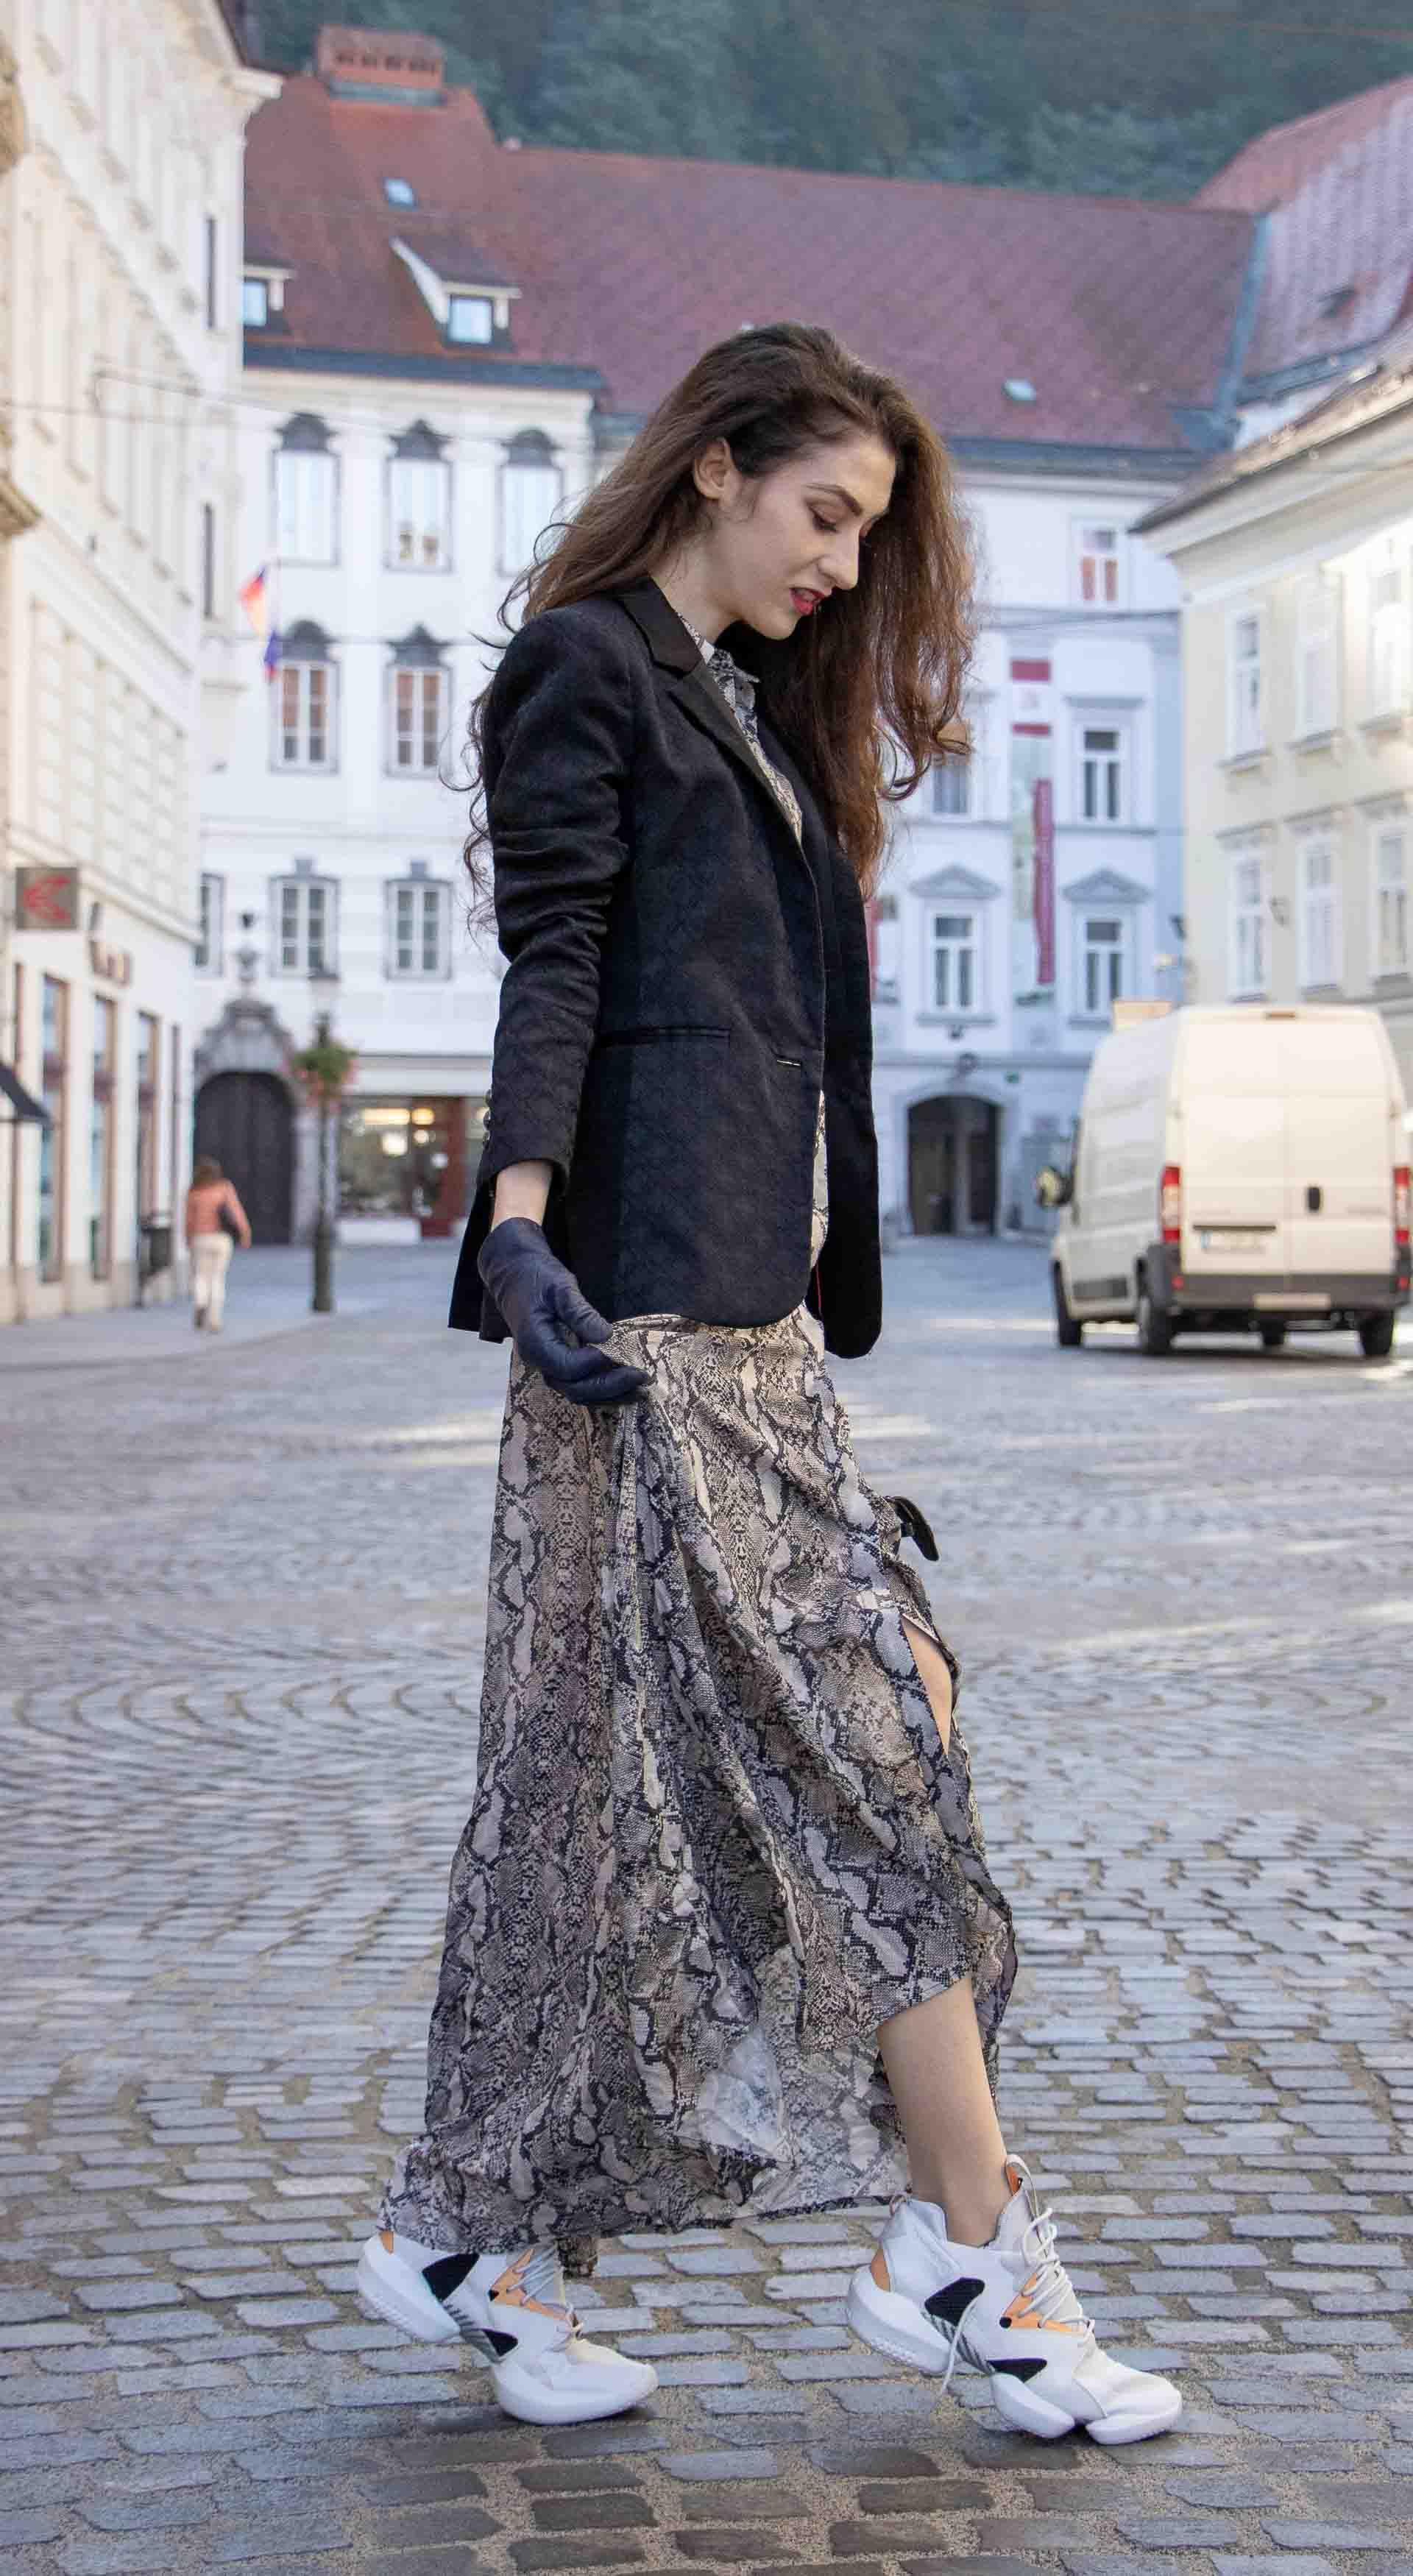 b4dc4d91948 Beautiful Slovenian Fashion Blogger Veronika Lipar of Brunette from Wall  wearing Zara snake print dress with black boyfriend blazer